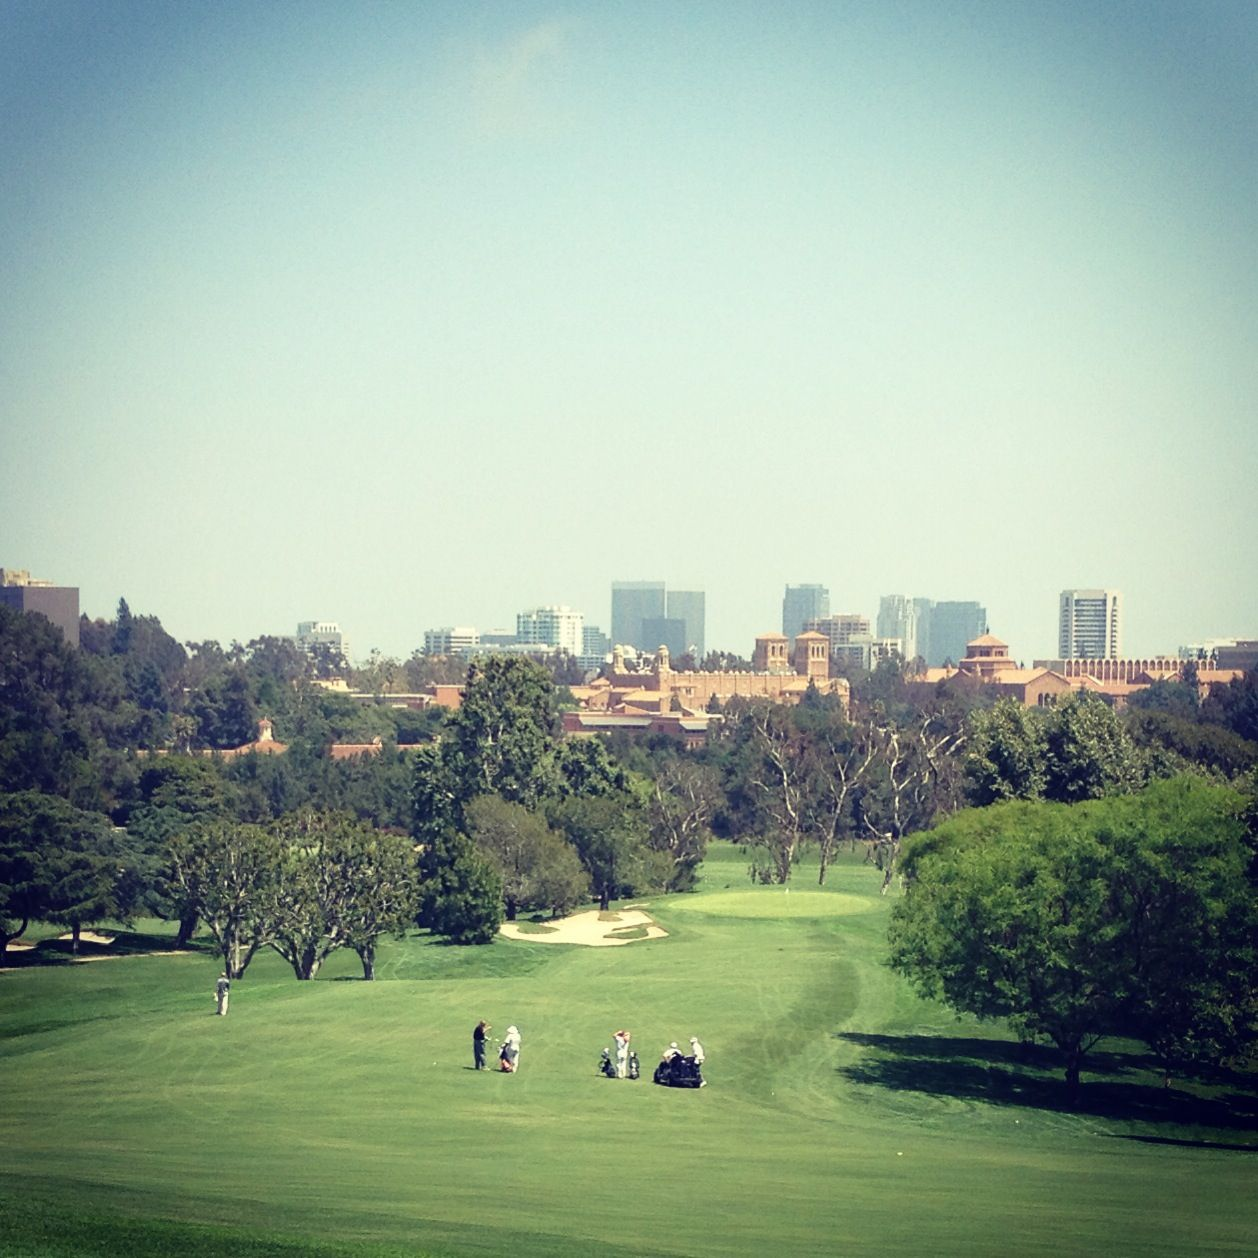 Bel Air Bel air, Dolores park, Golf courses